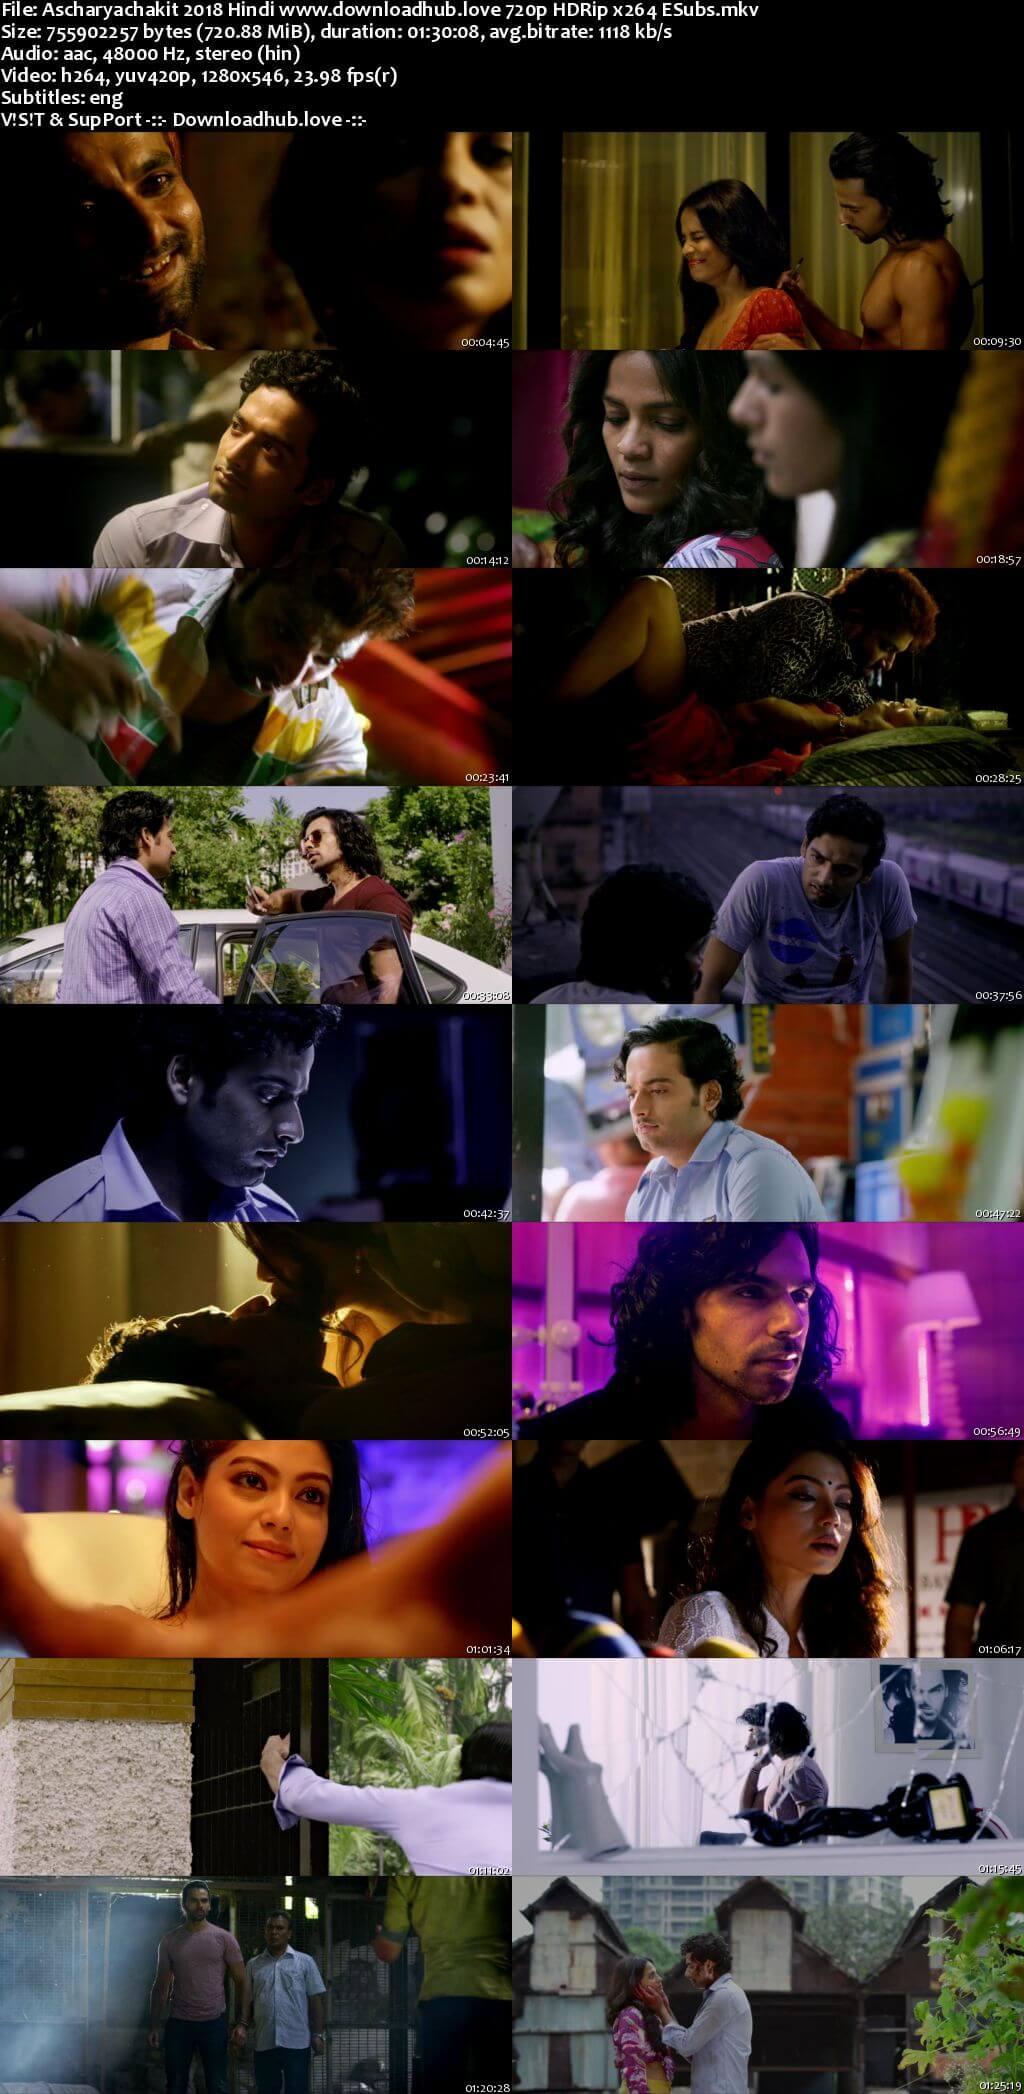 Ascharyachakit! 2018 Hindi 720p HDRip ESubs